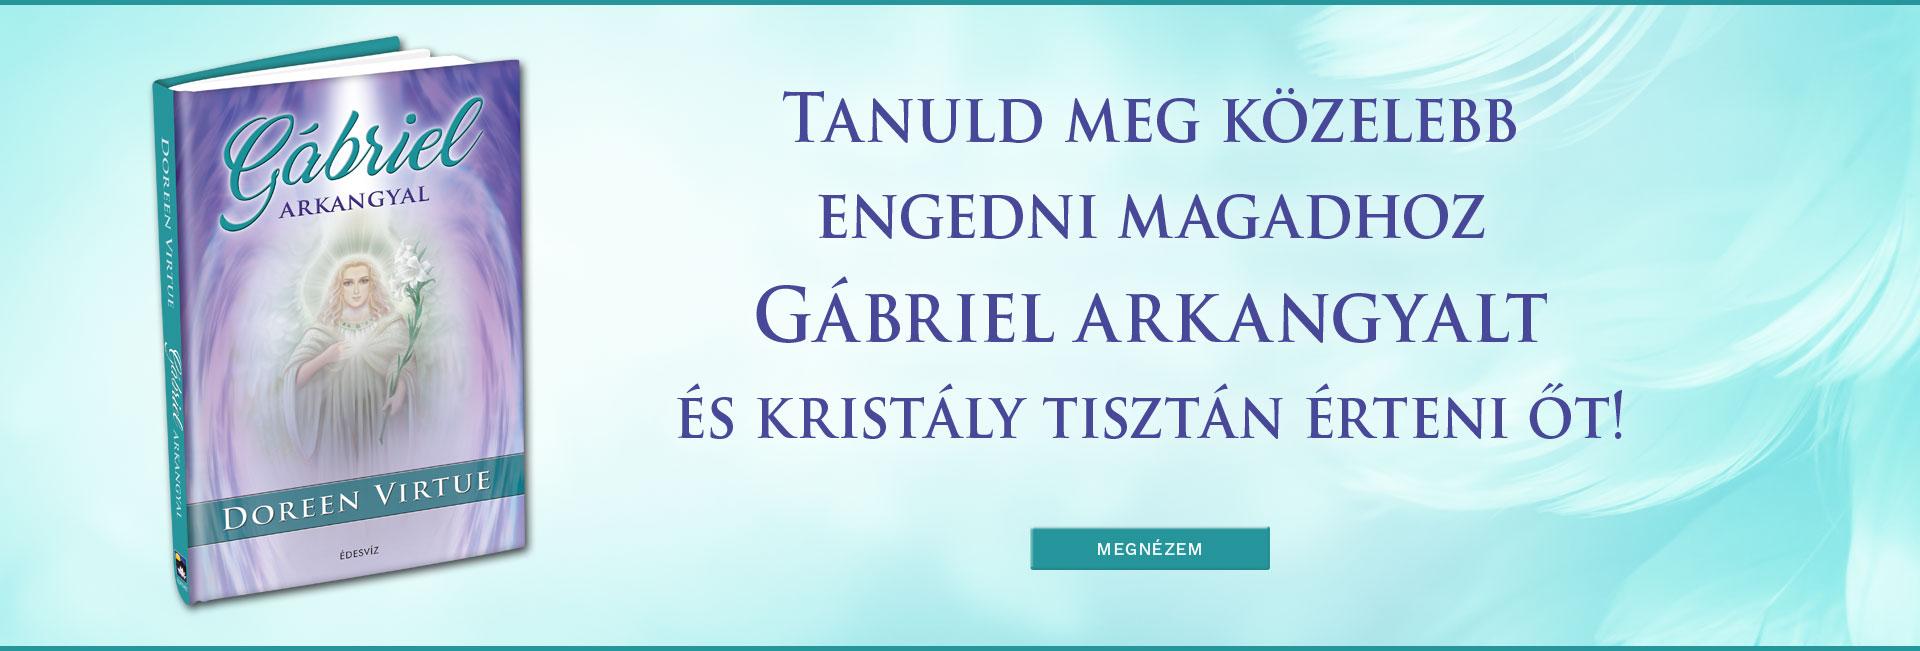 slide_kepek_asztaligep_gabriel